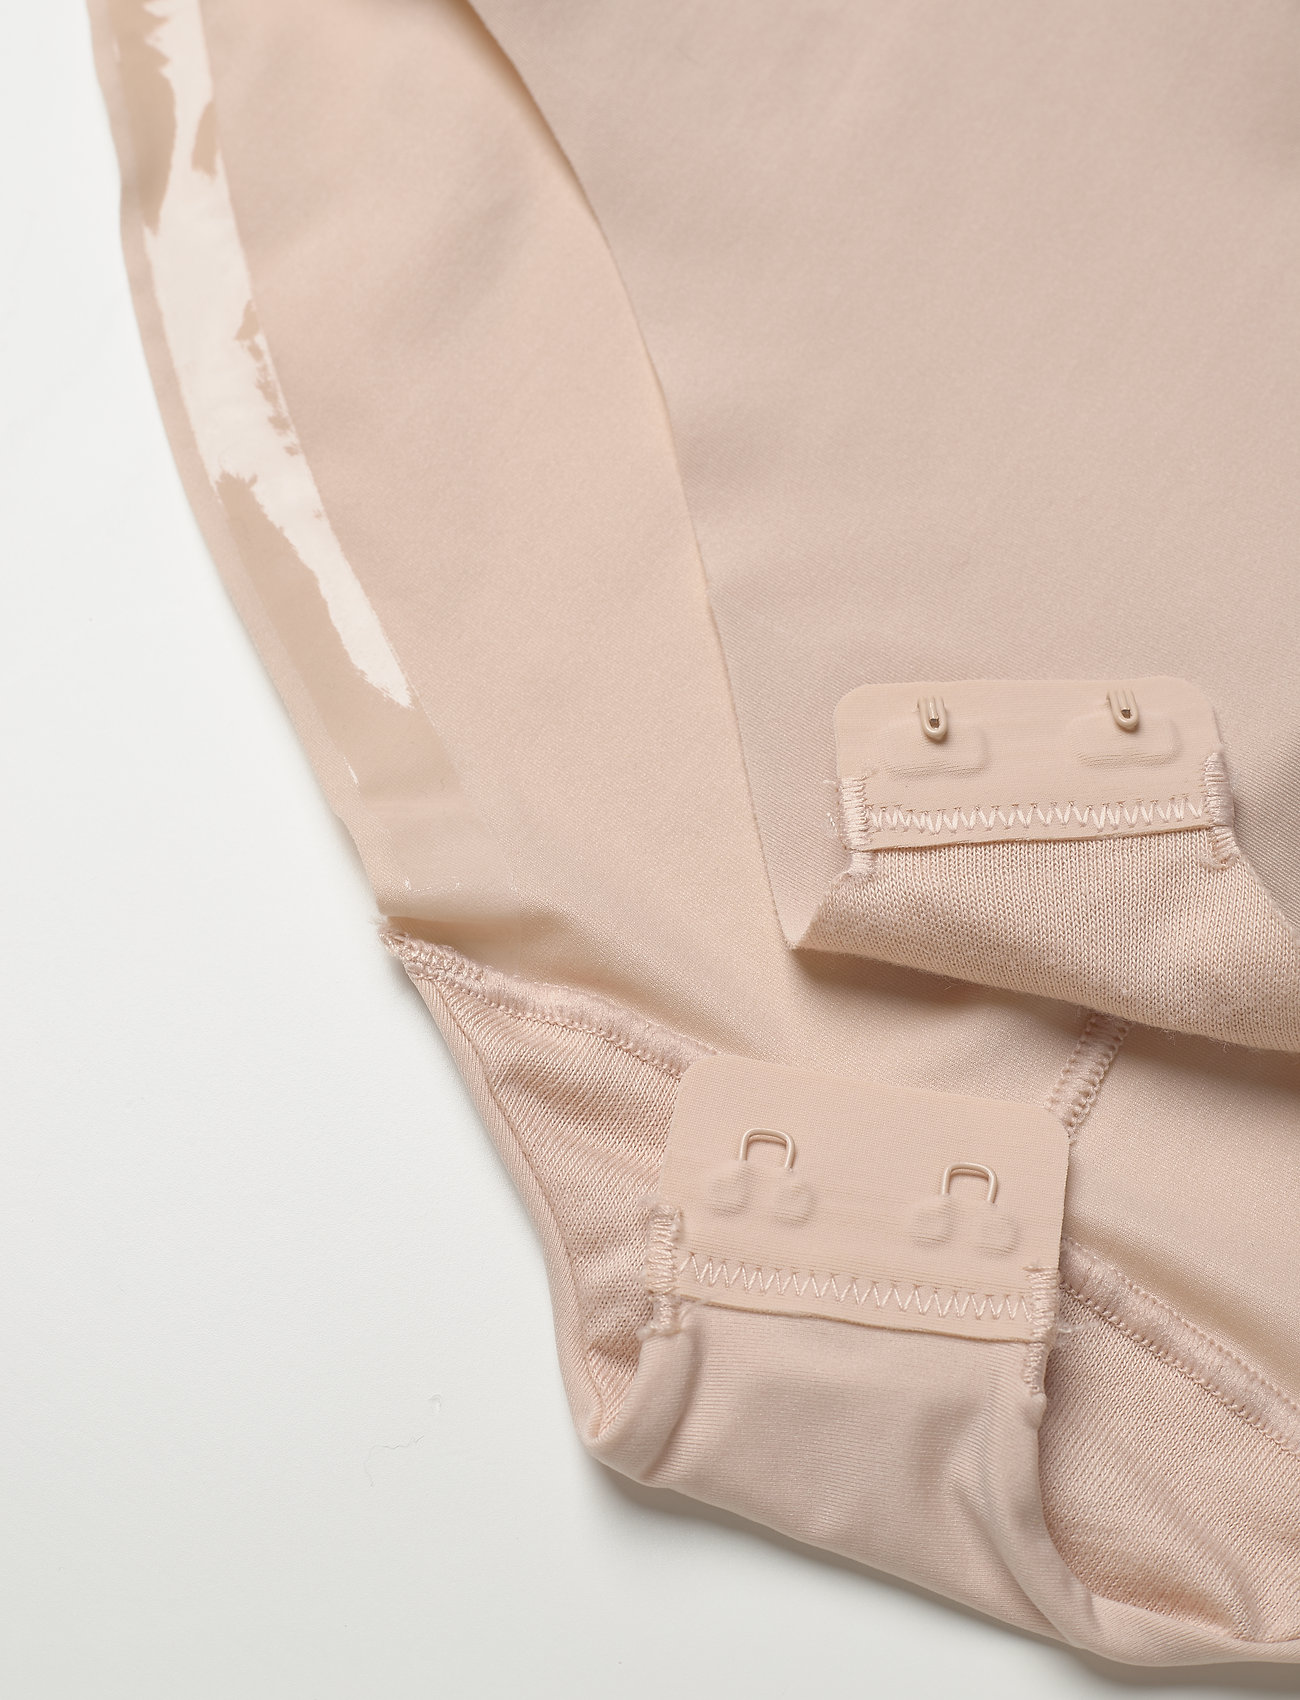 Bodysuit (Soft Nude) (519.20 kr) - Spanx 7gCgxXt4